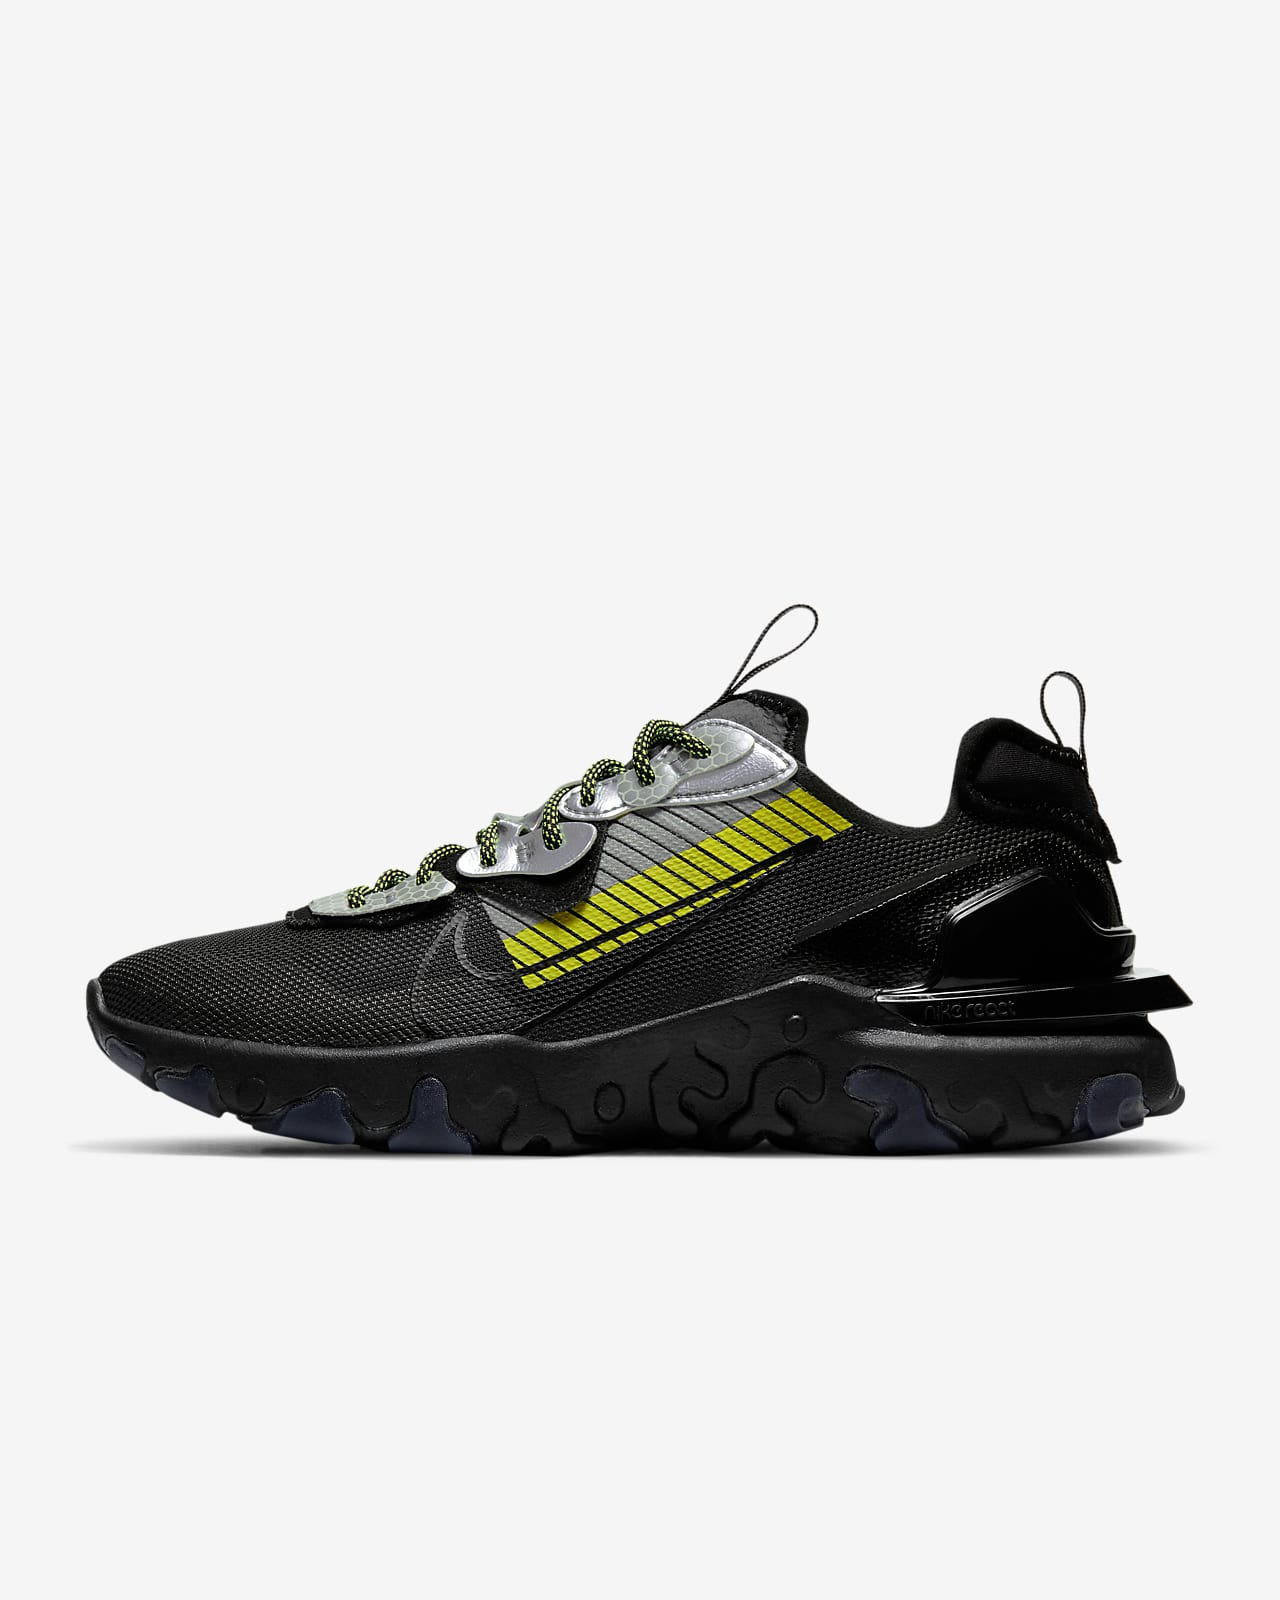 Nike React Vision PRM 3M™ Men's Shoe. Nike LU